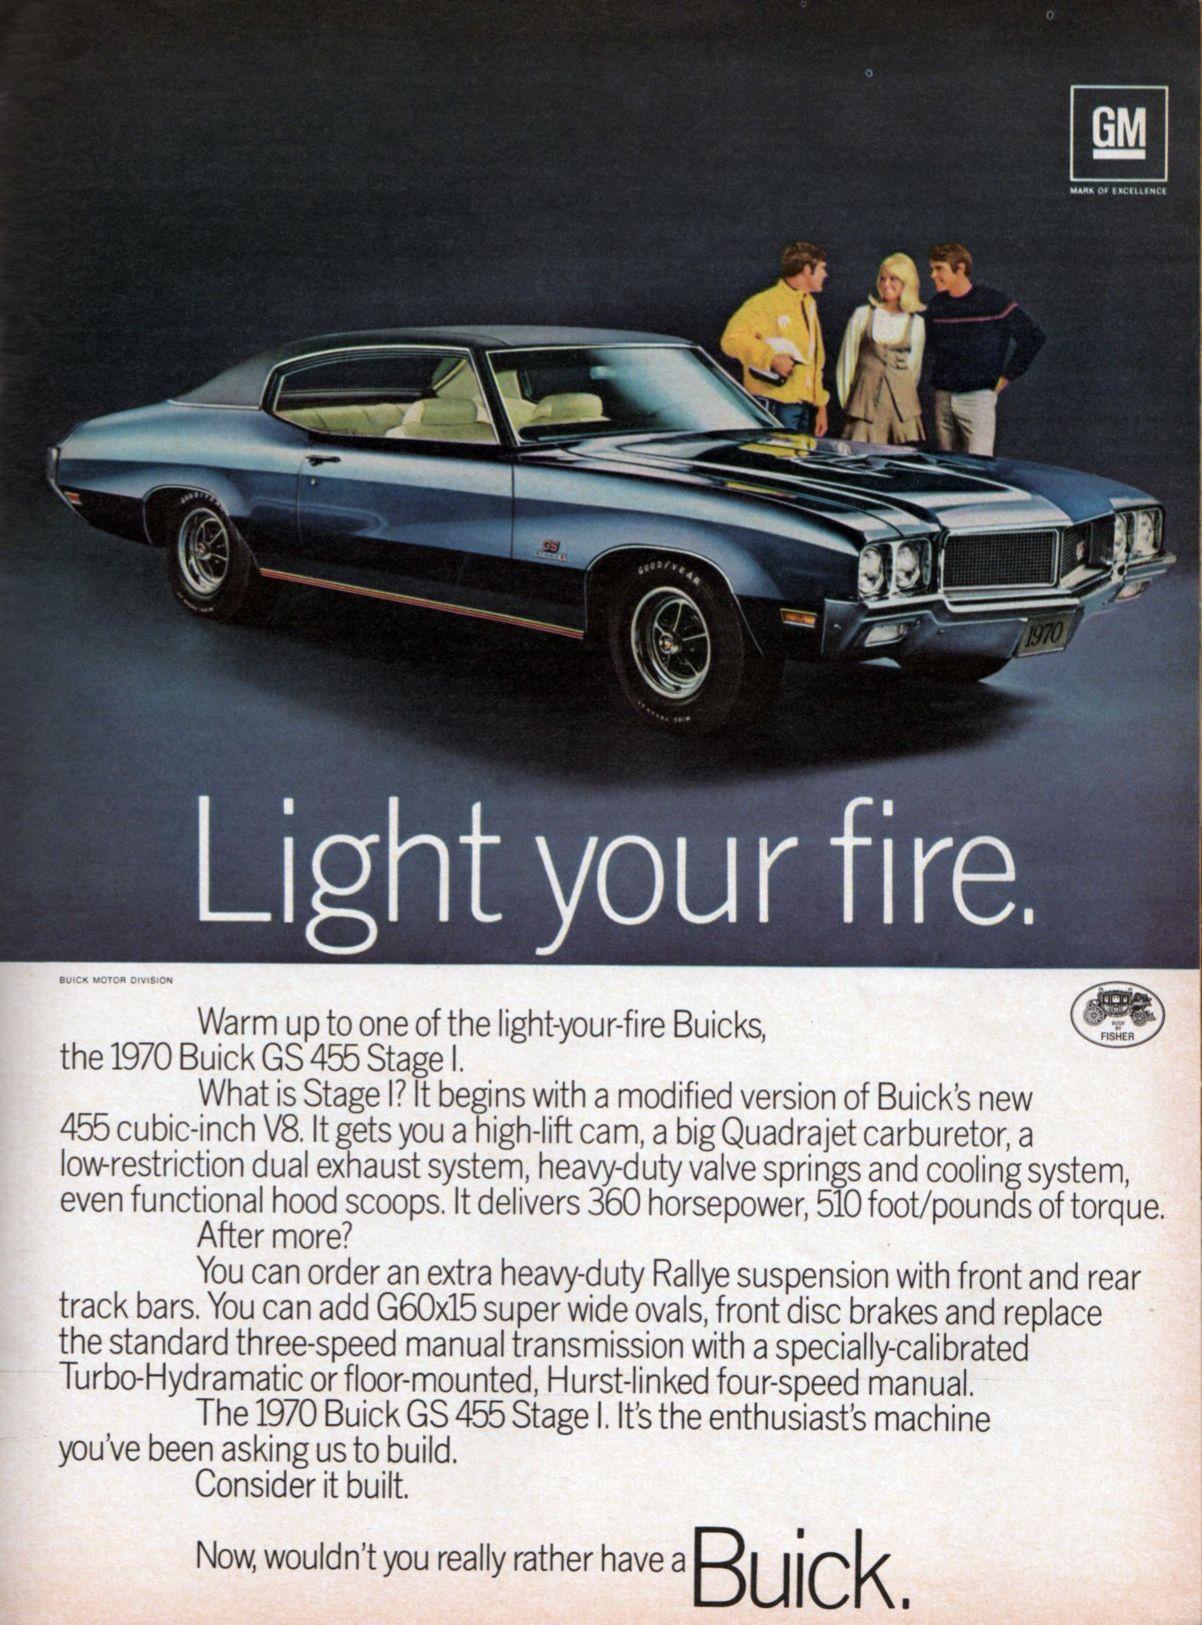 67 Buick Skylark : buick, skylark, Buick, Stage